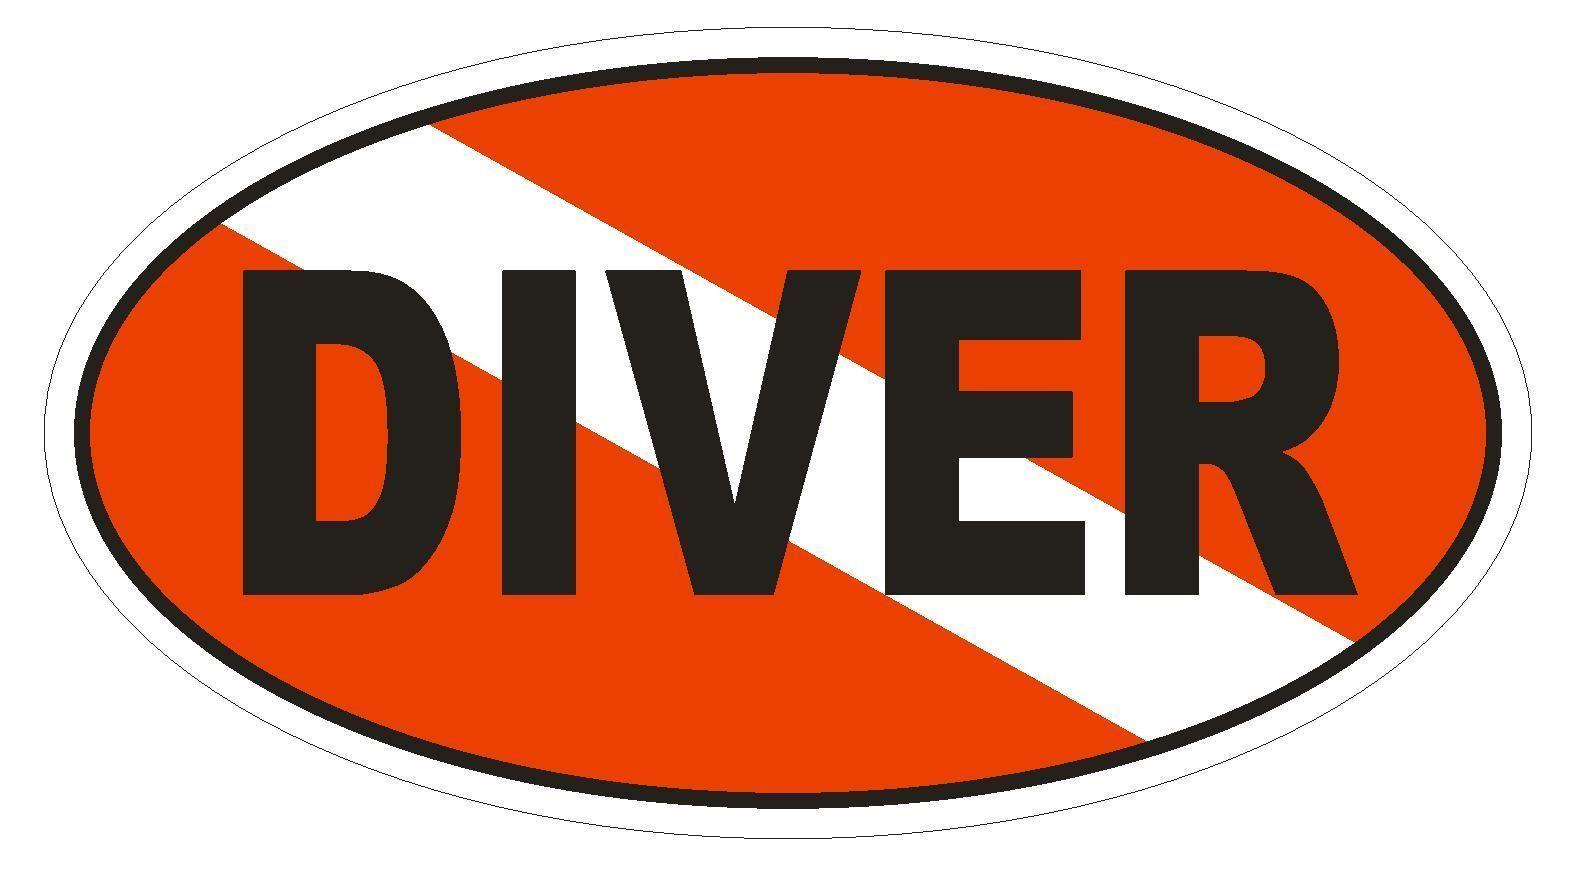 DIVER Oval Bumper Sticker or Helmet Sticker D1835 Euro Oval - $1.39 - $75.00